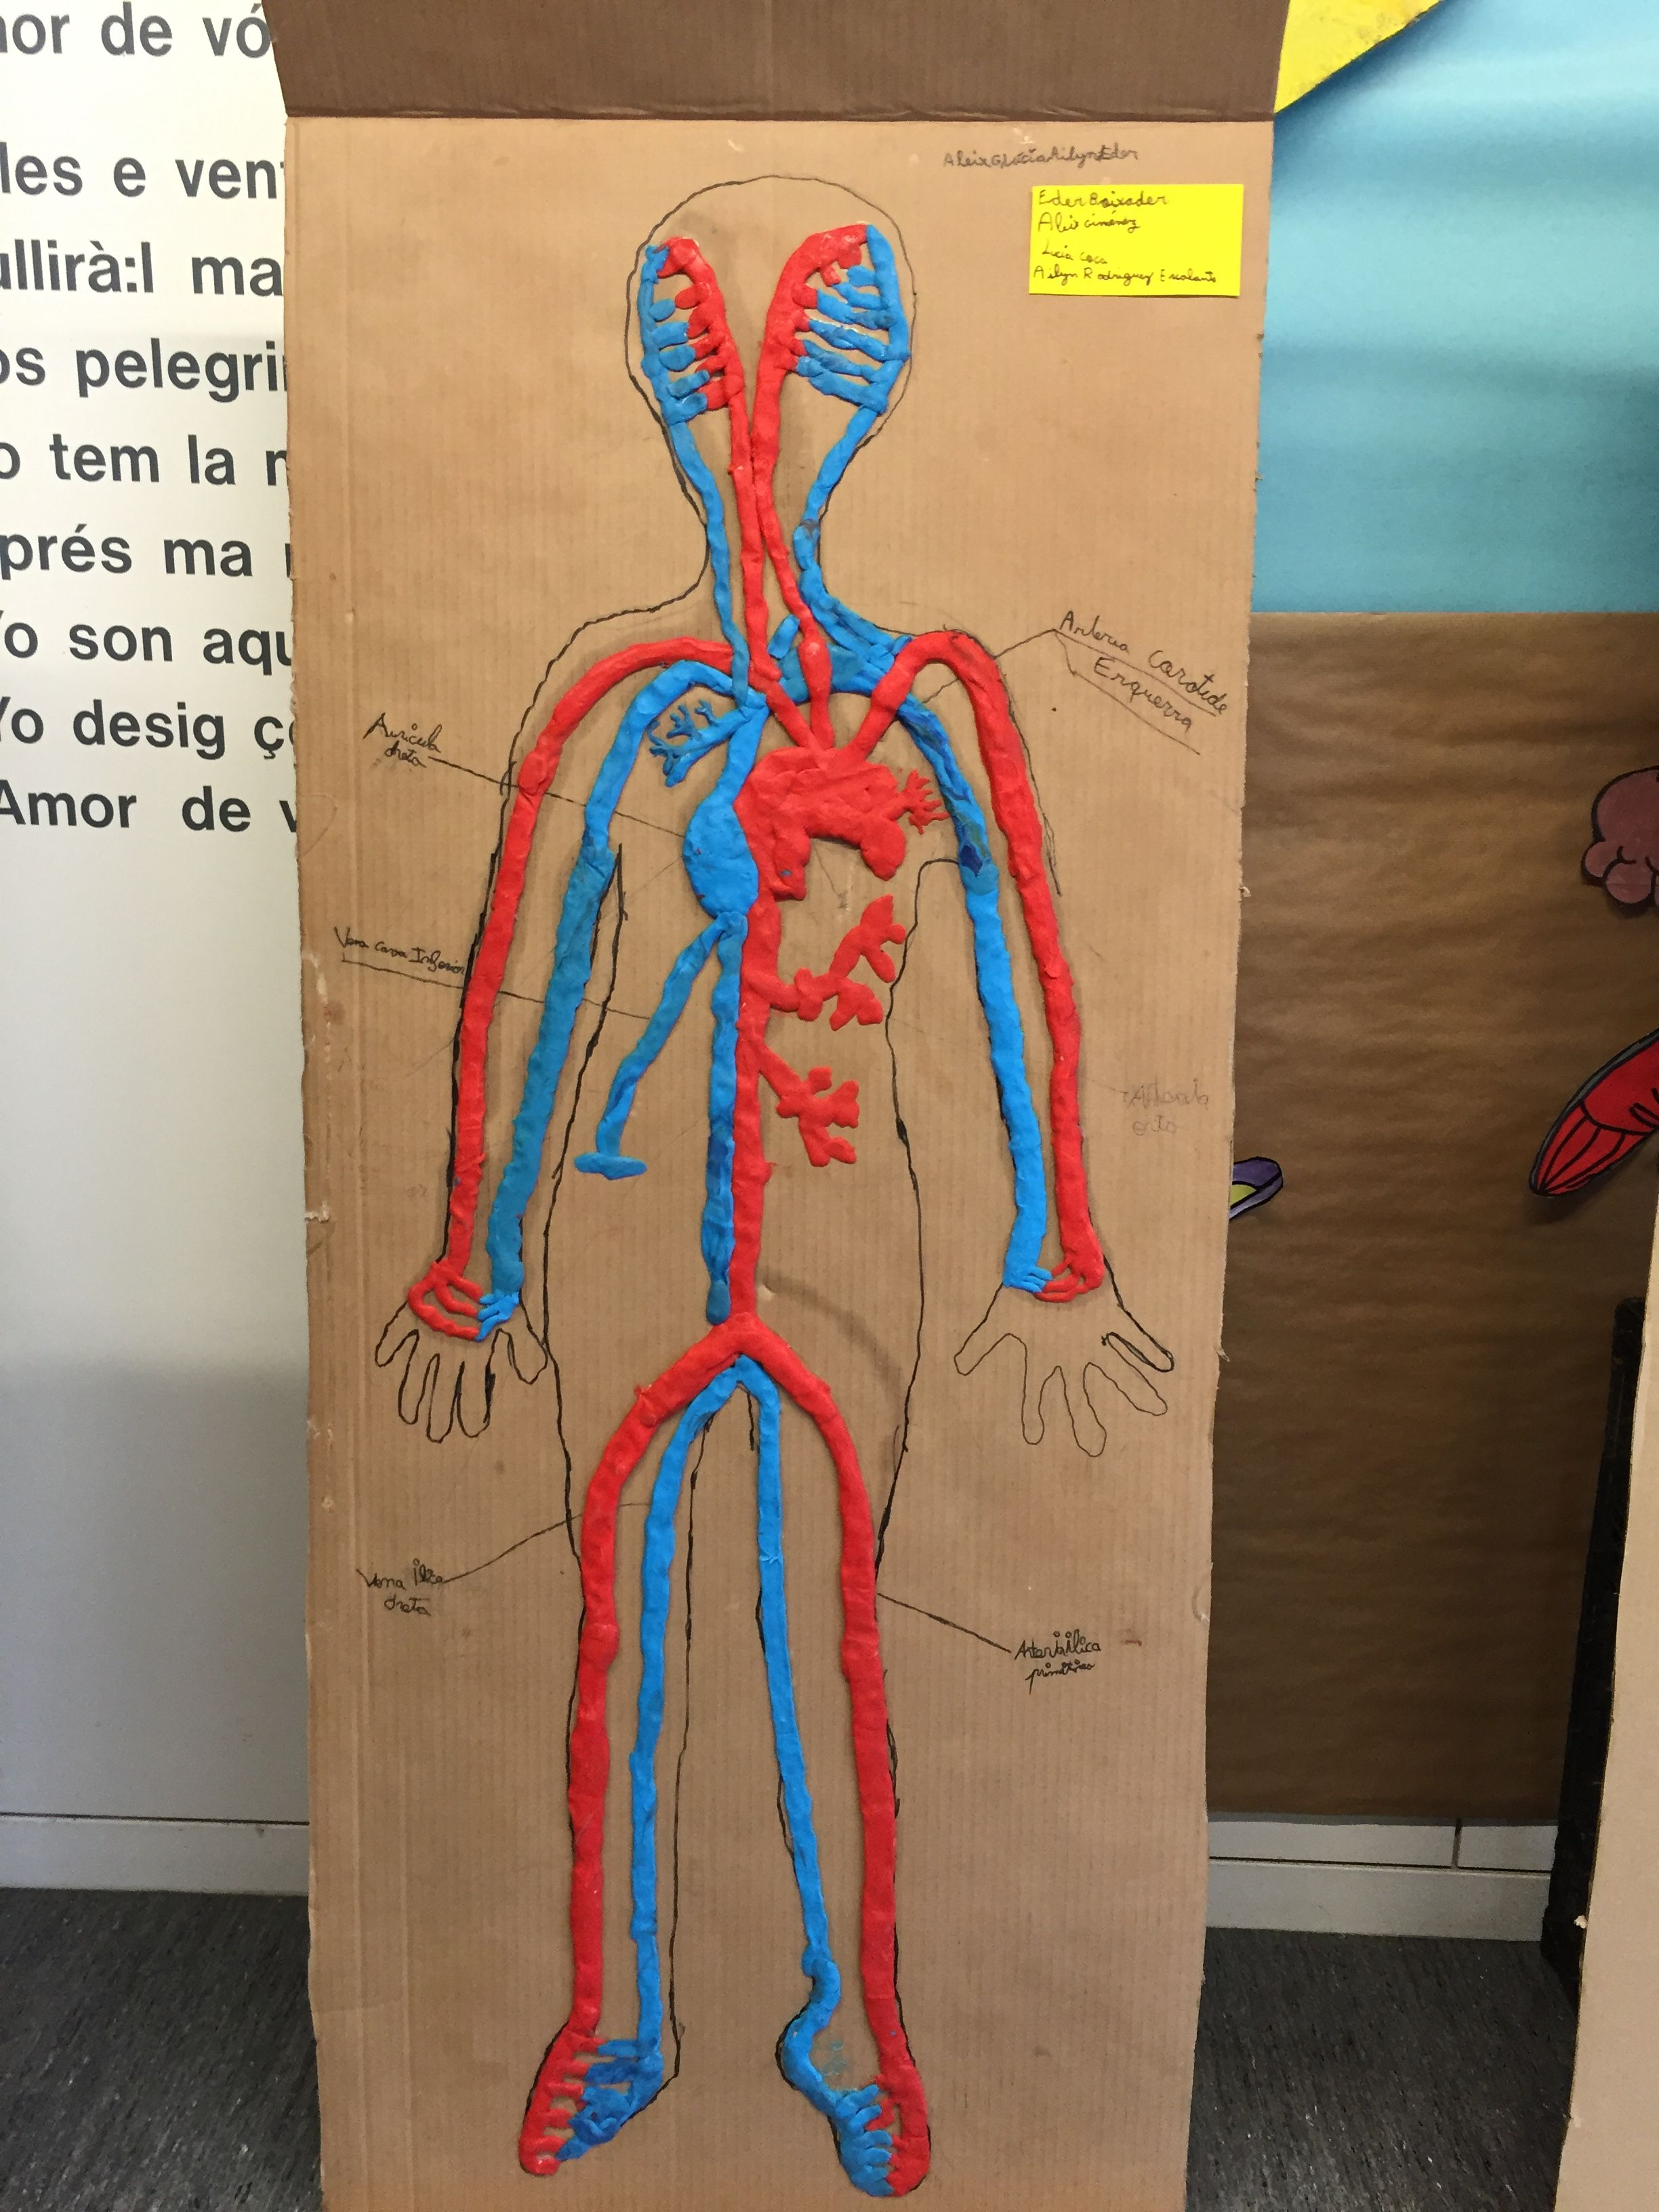 Aparell circulatori a l'escola Maqueta cuerpo humano